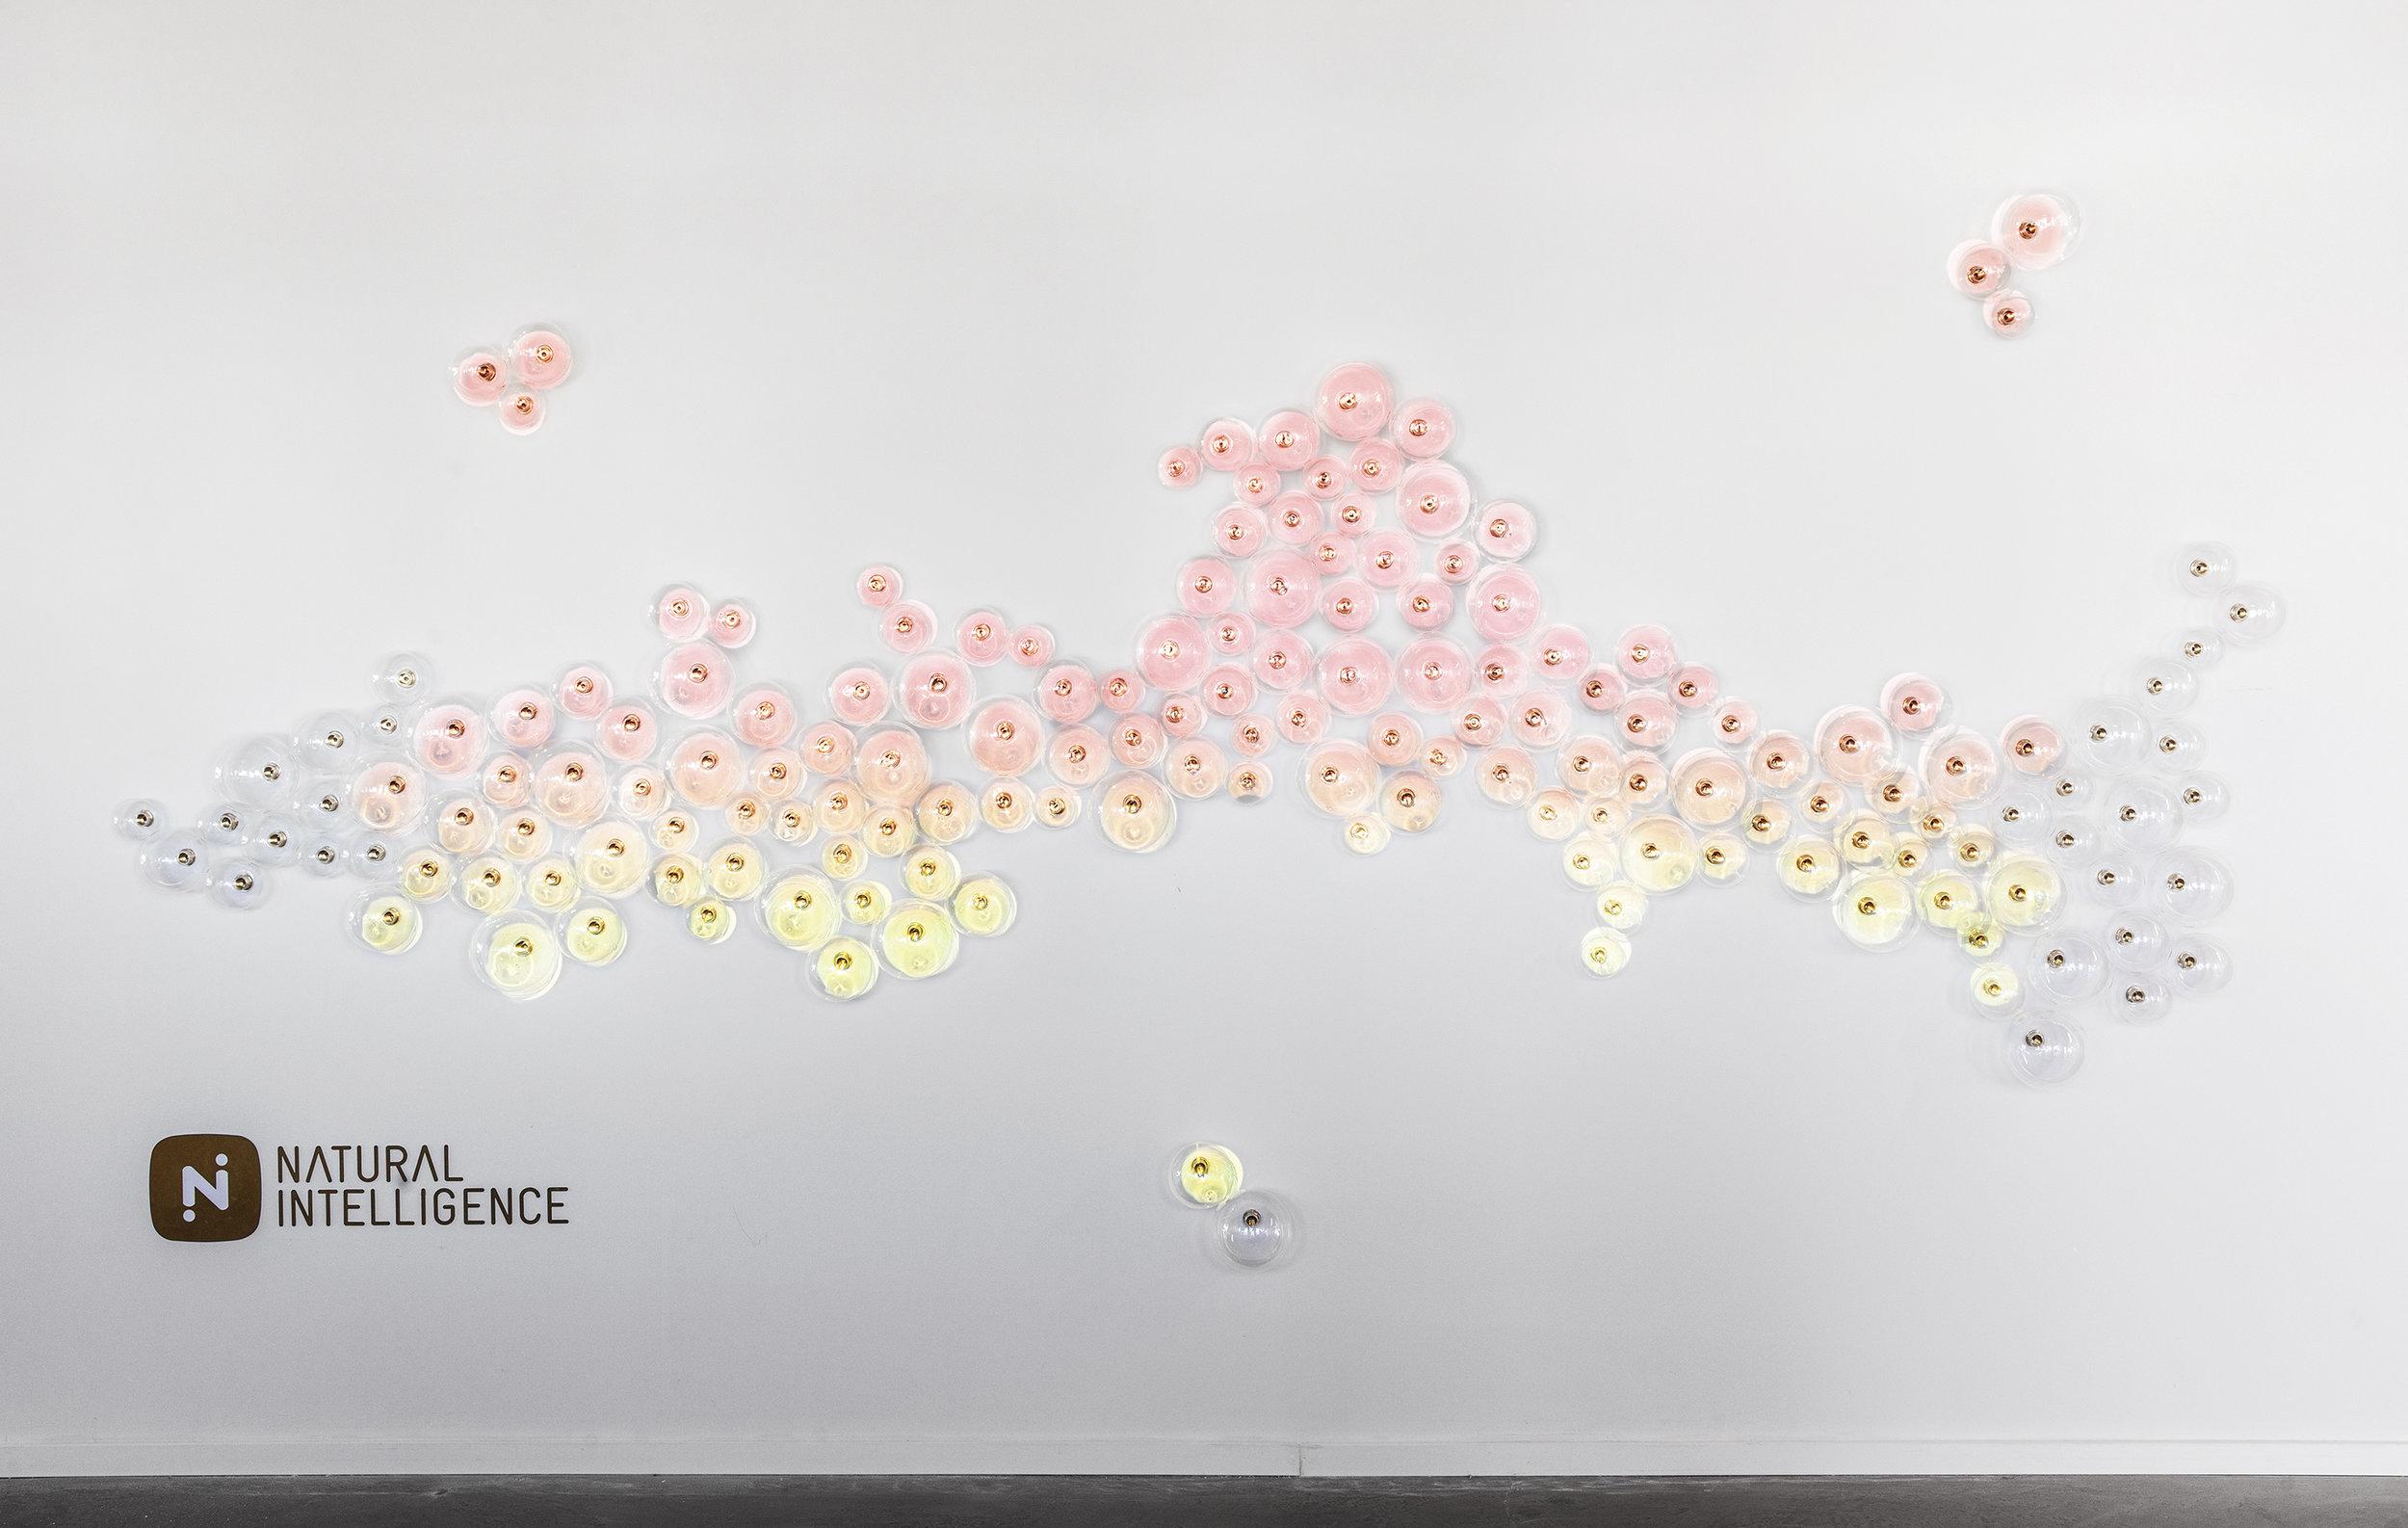 רואי דוד אדריכלות - אדריכל - נטורל אינטליג'נס - ROY DAVID - ARCHITECTURE - ARCHITECT - NI (53).jpg